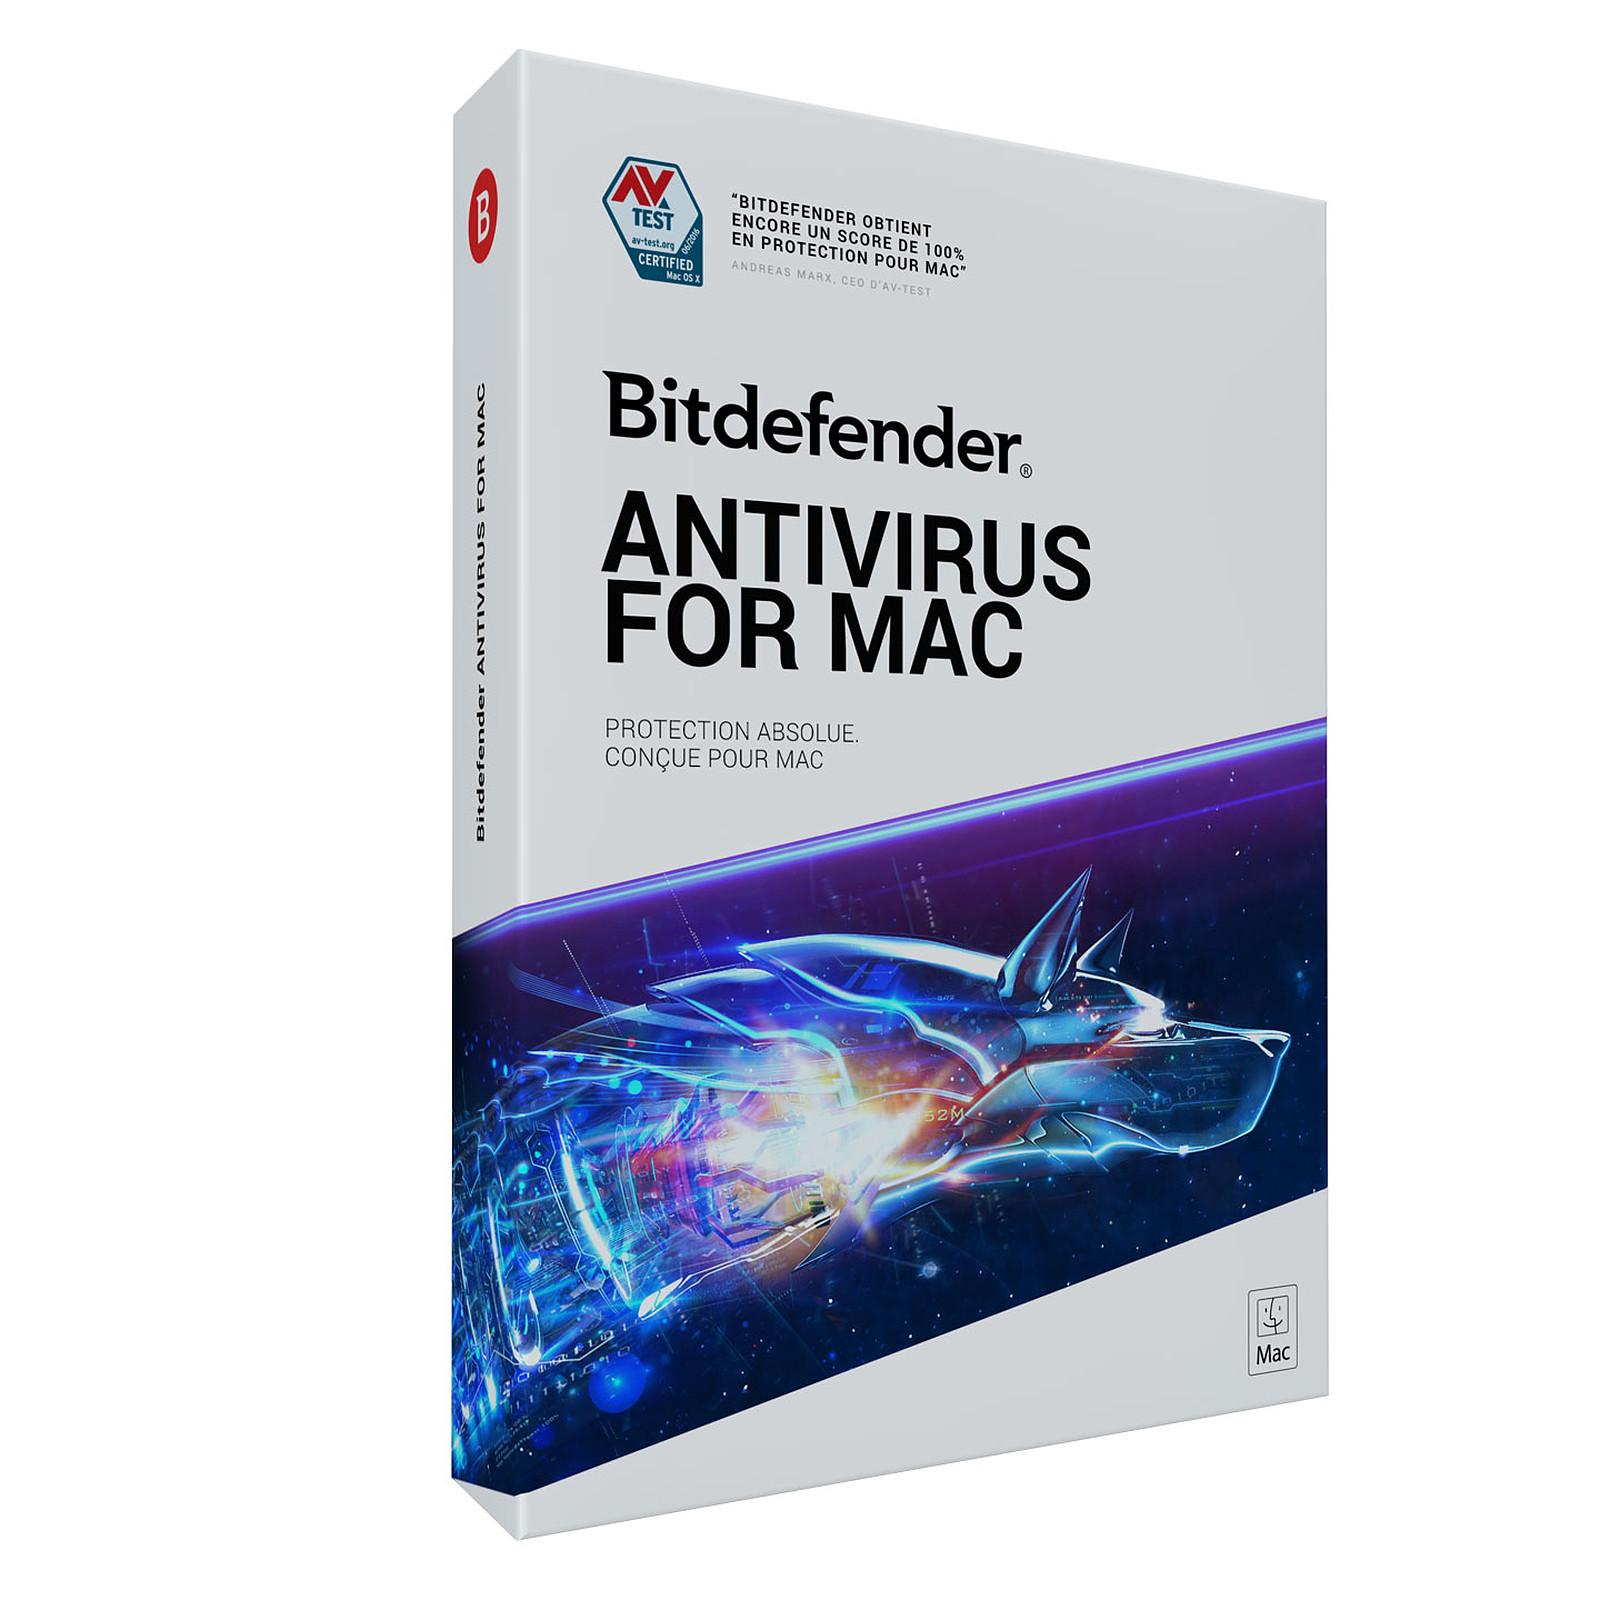 bitdefender antivirus for mac 2019